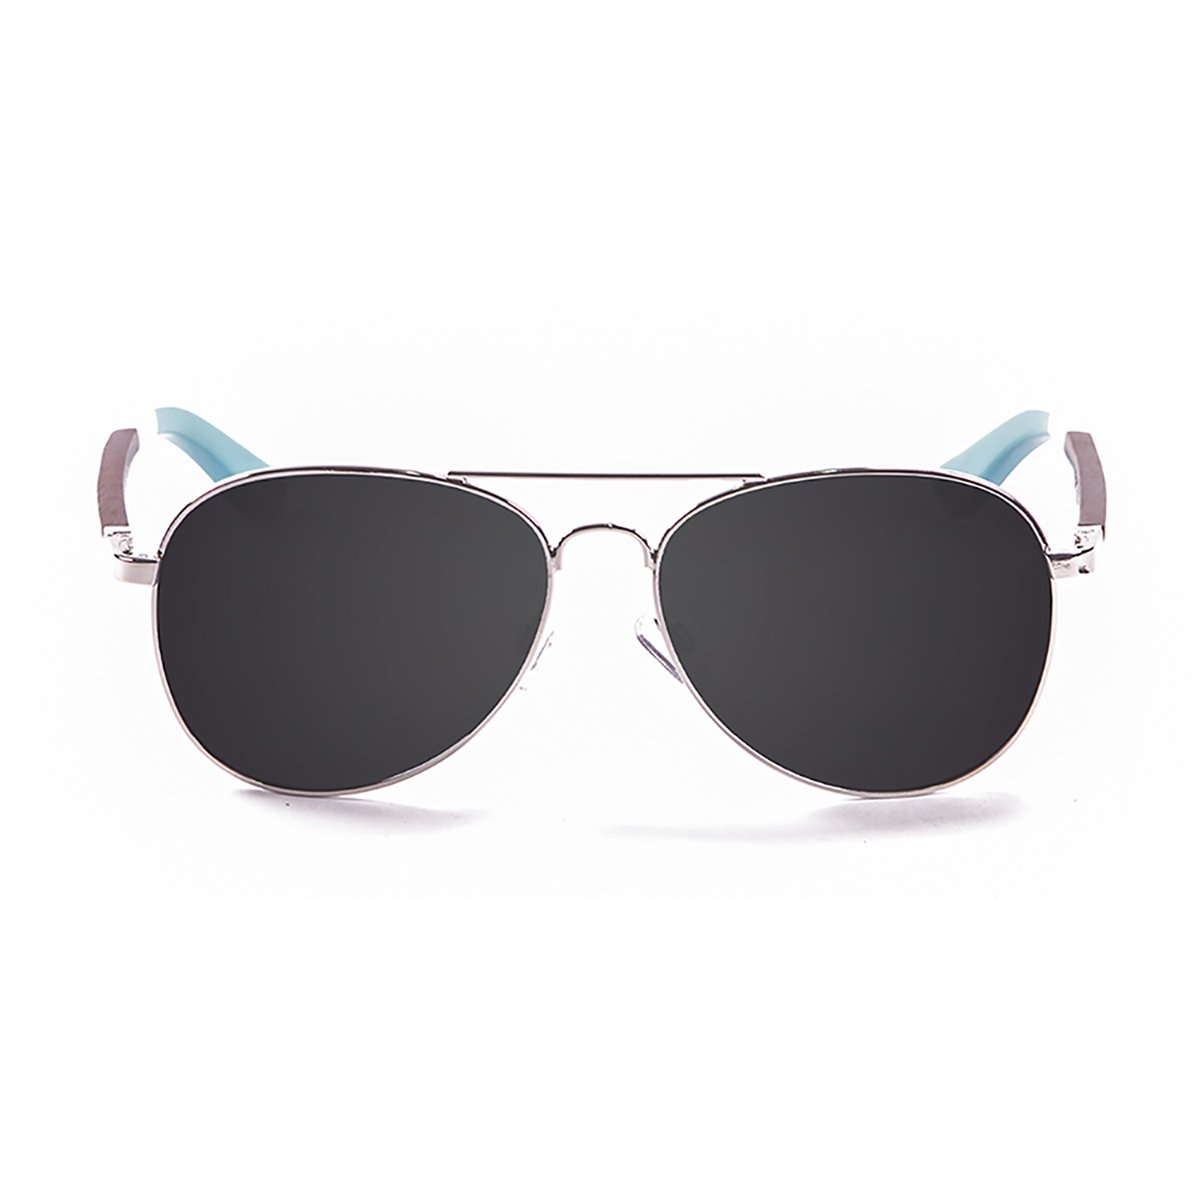 Paloalto San Diego Sonnebrille, Unisex, Erwachsene, silber-Metall/Holz/Dunkelblau